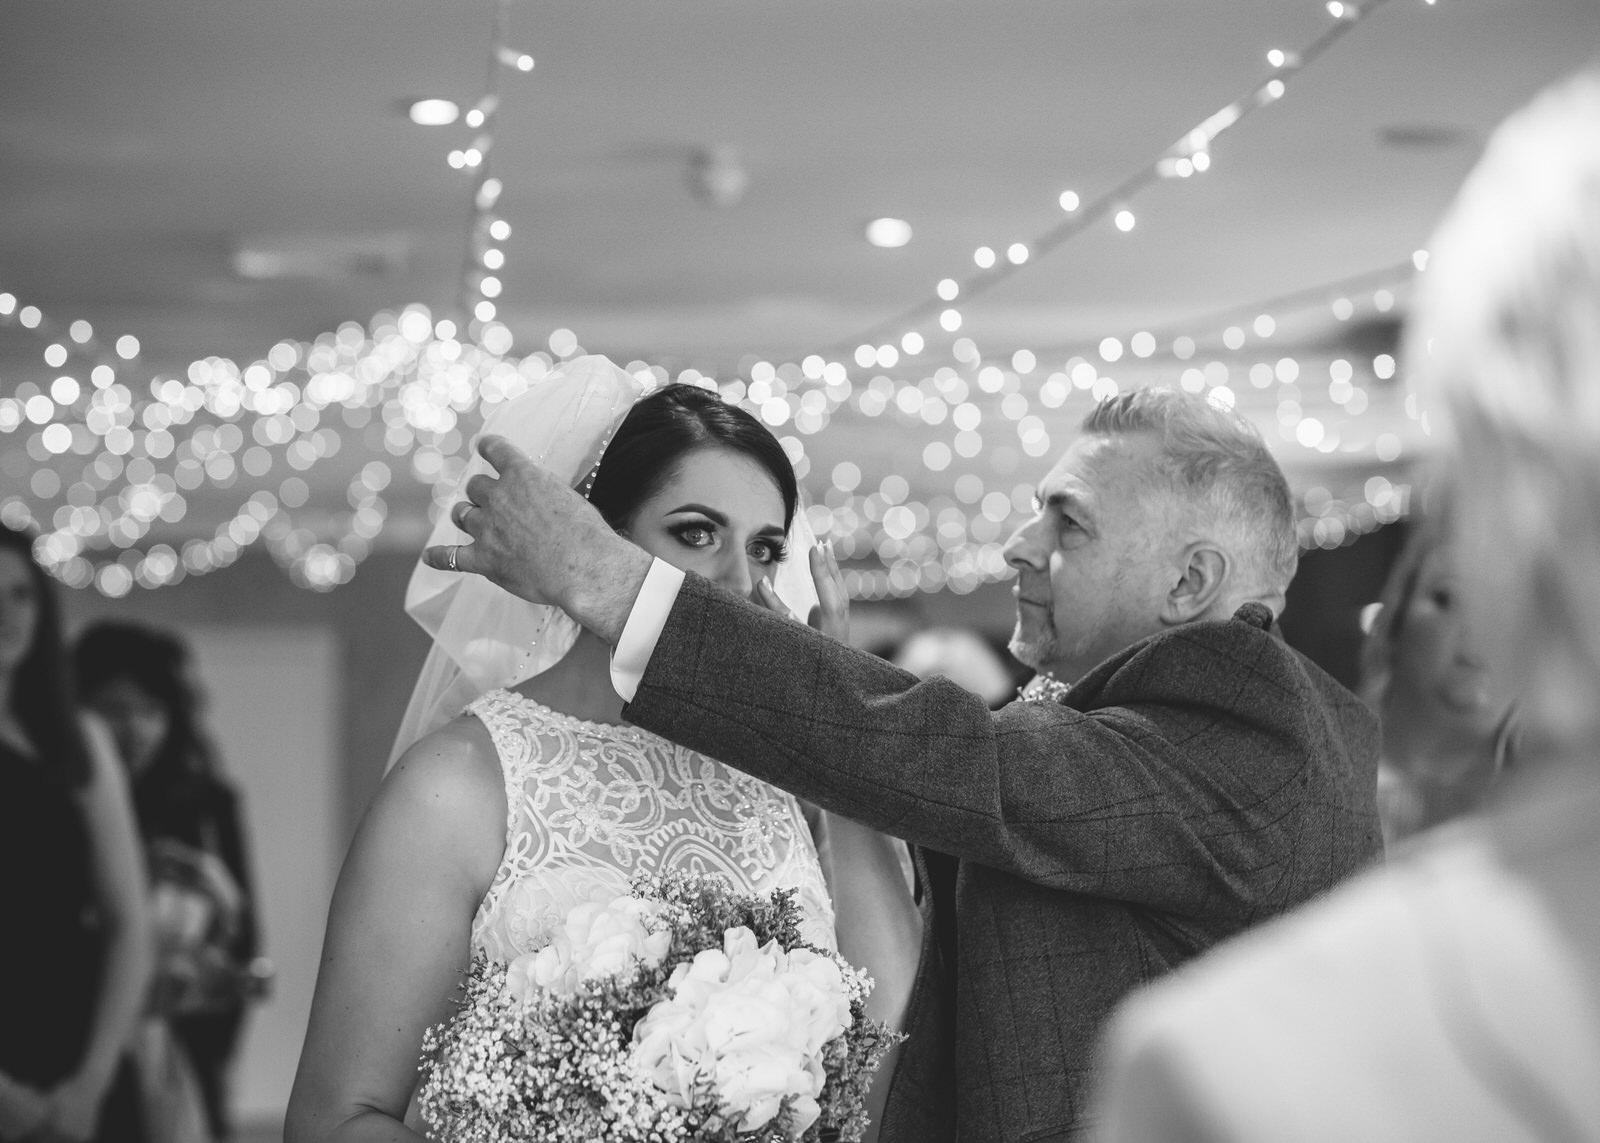 aberdeen wedding photographer, Banchory lodge wedding photography, weddings at Banchory lodge, Banchory lodge hotel, Vivienne Elizabeth Photography, wedding ceremony, crying bride, bride arriving at wedding